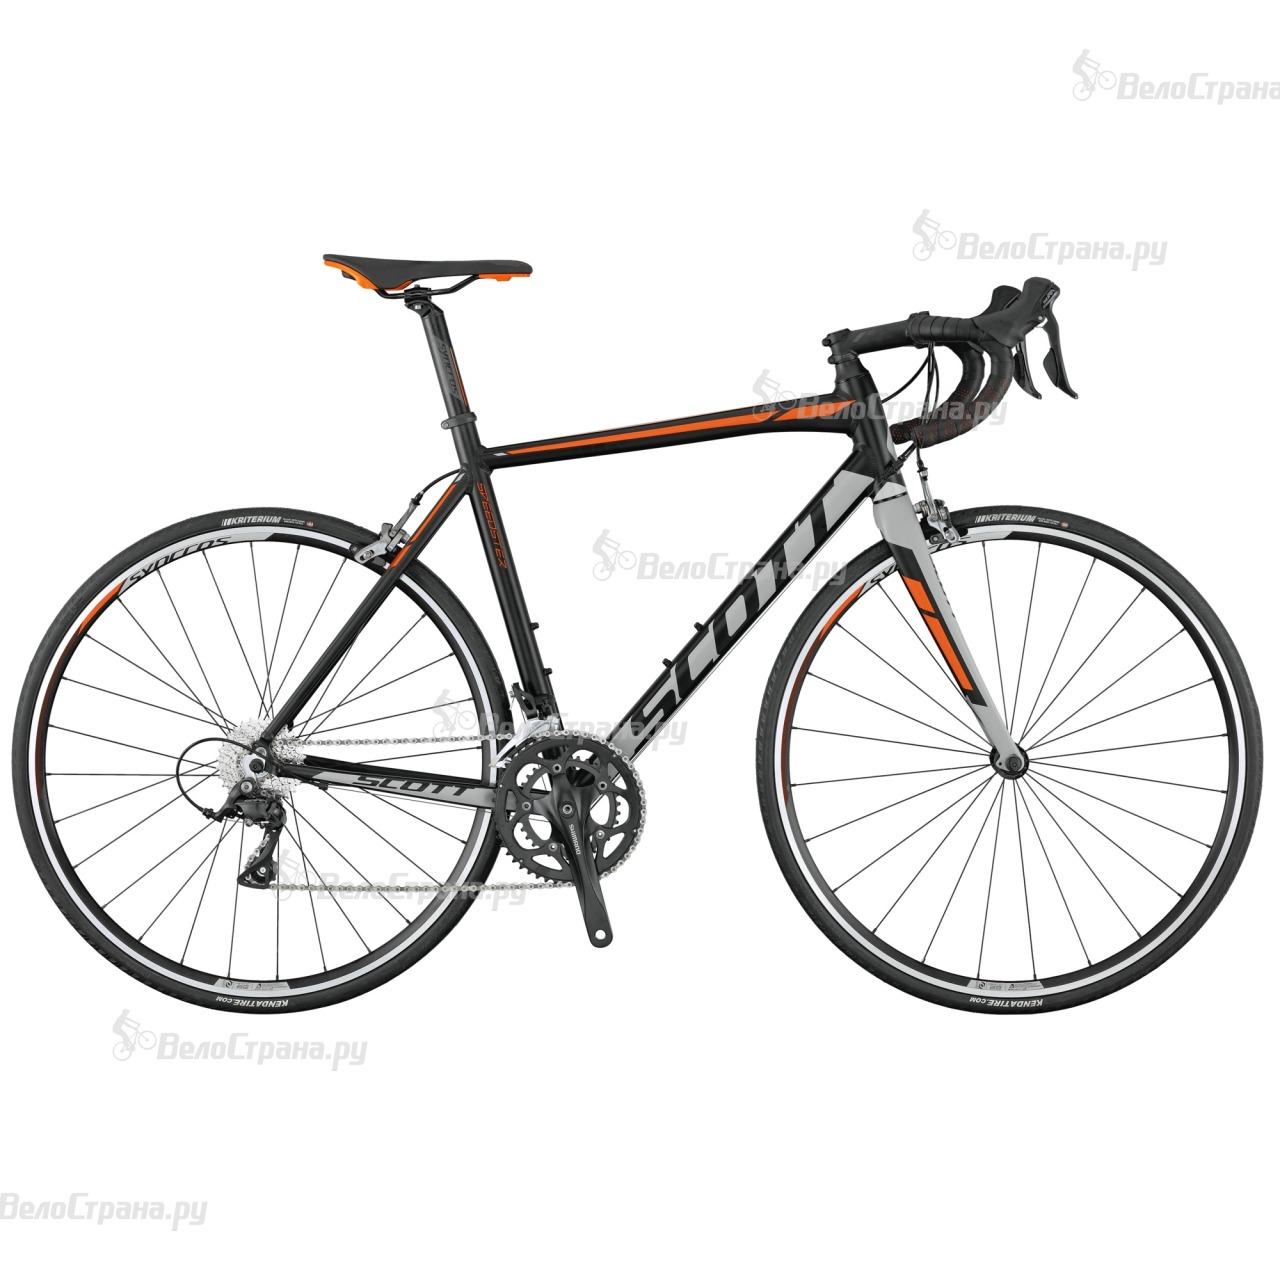 Велосипед Scott Speedster 30 (2017) велосипед scott speedster 30 disc 2016